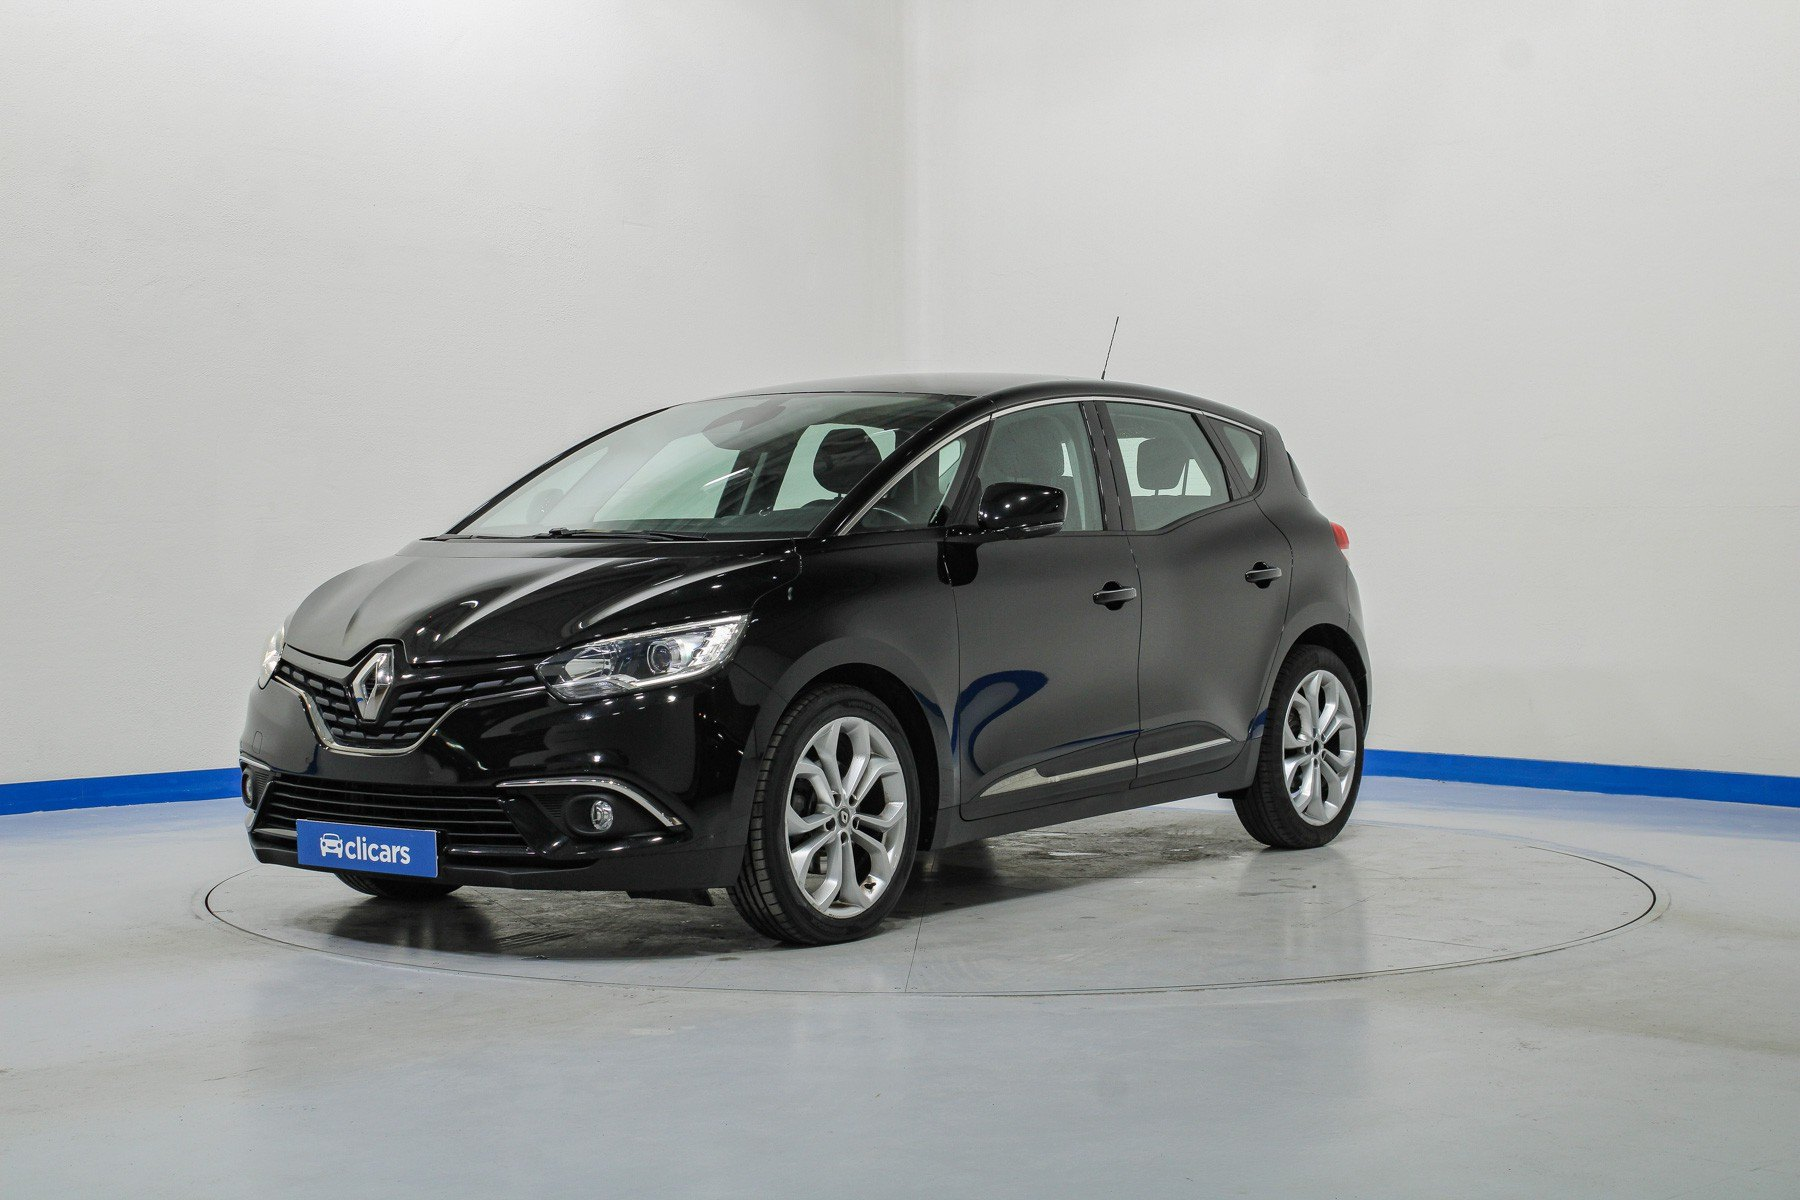 Renault Scénic Diésel Intens Energy dCi 81kW (110CV) EDC 1